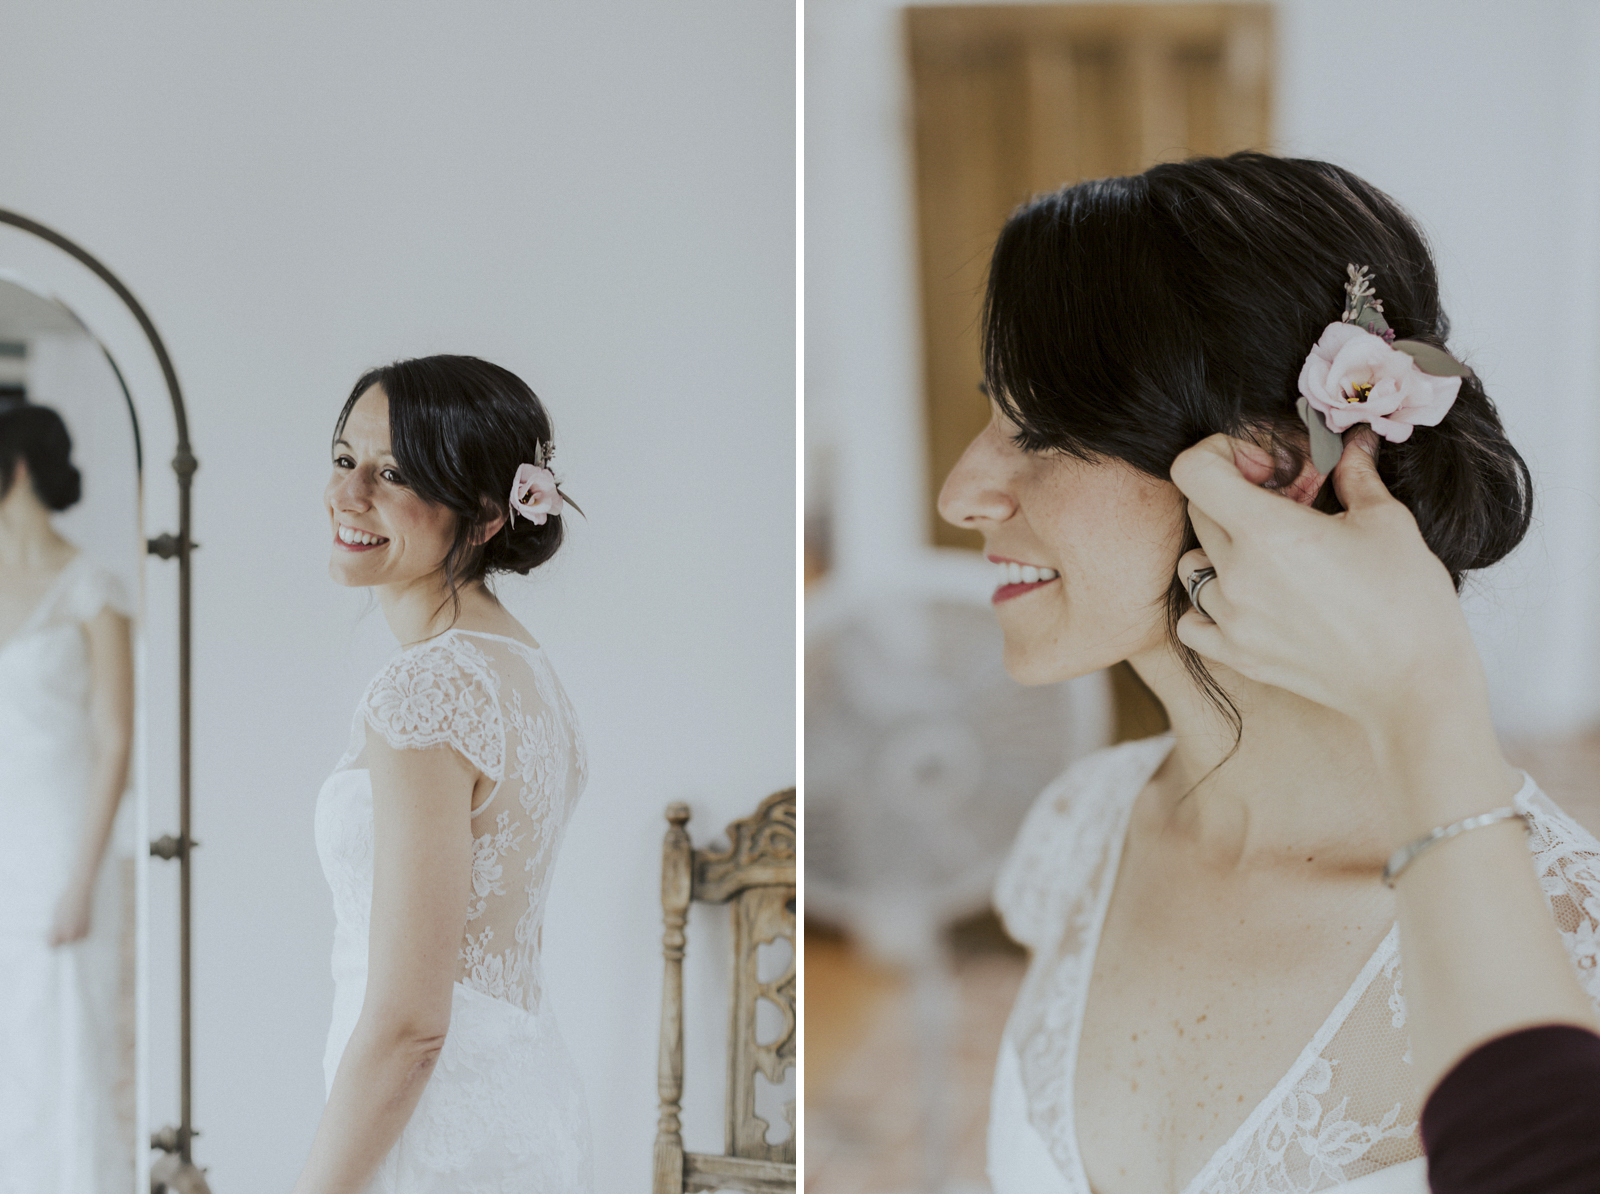 Jiwoo+Tara-Married-Blog-25.jpg